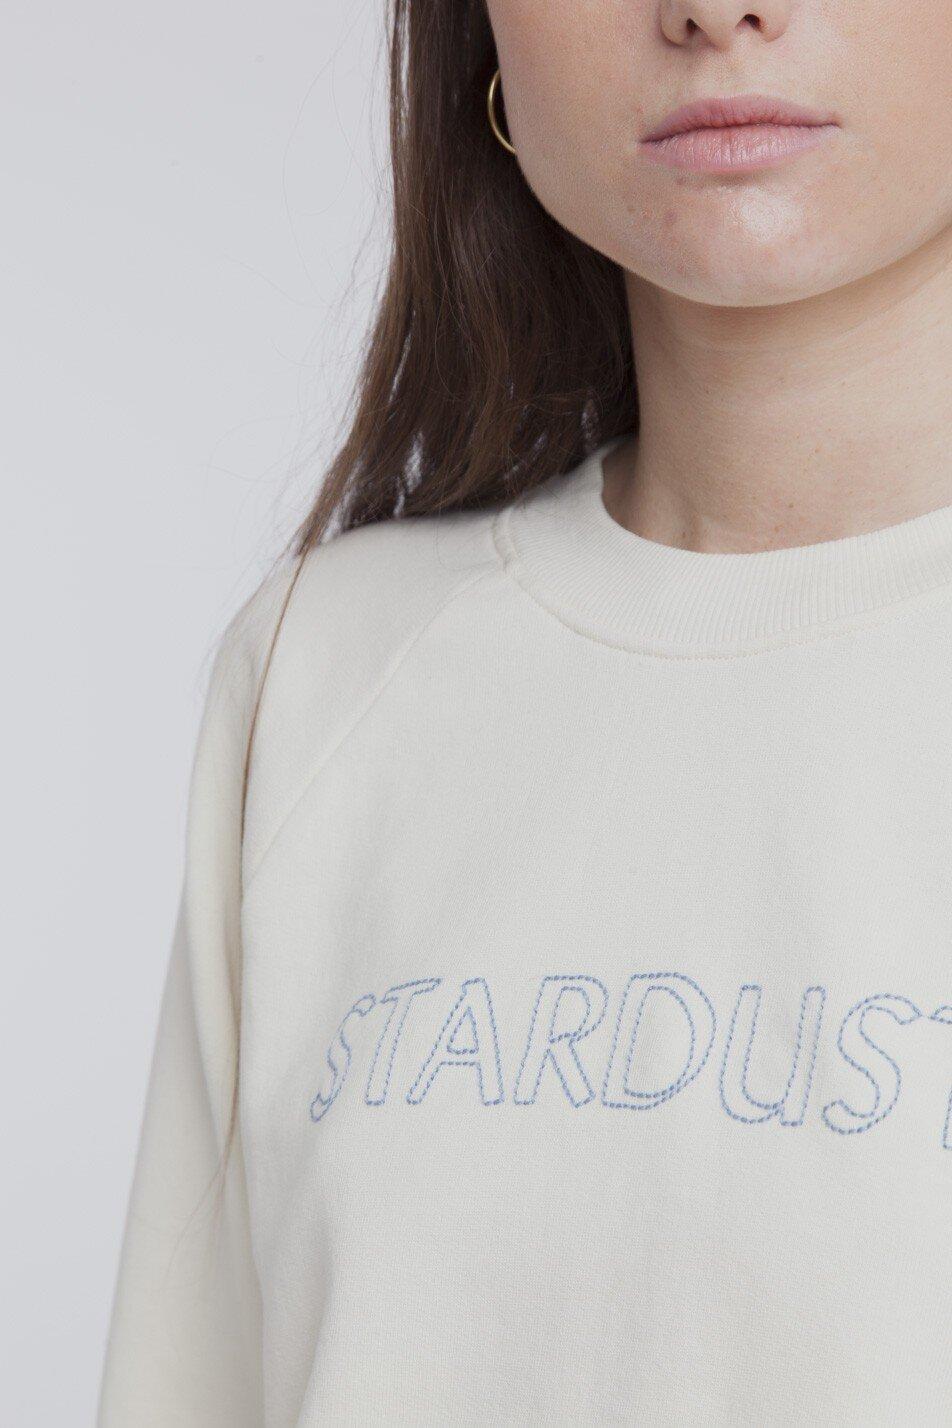 star-dust-raglan-sweatshirt-2.jpg